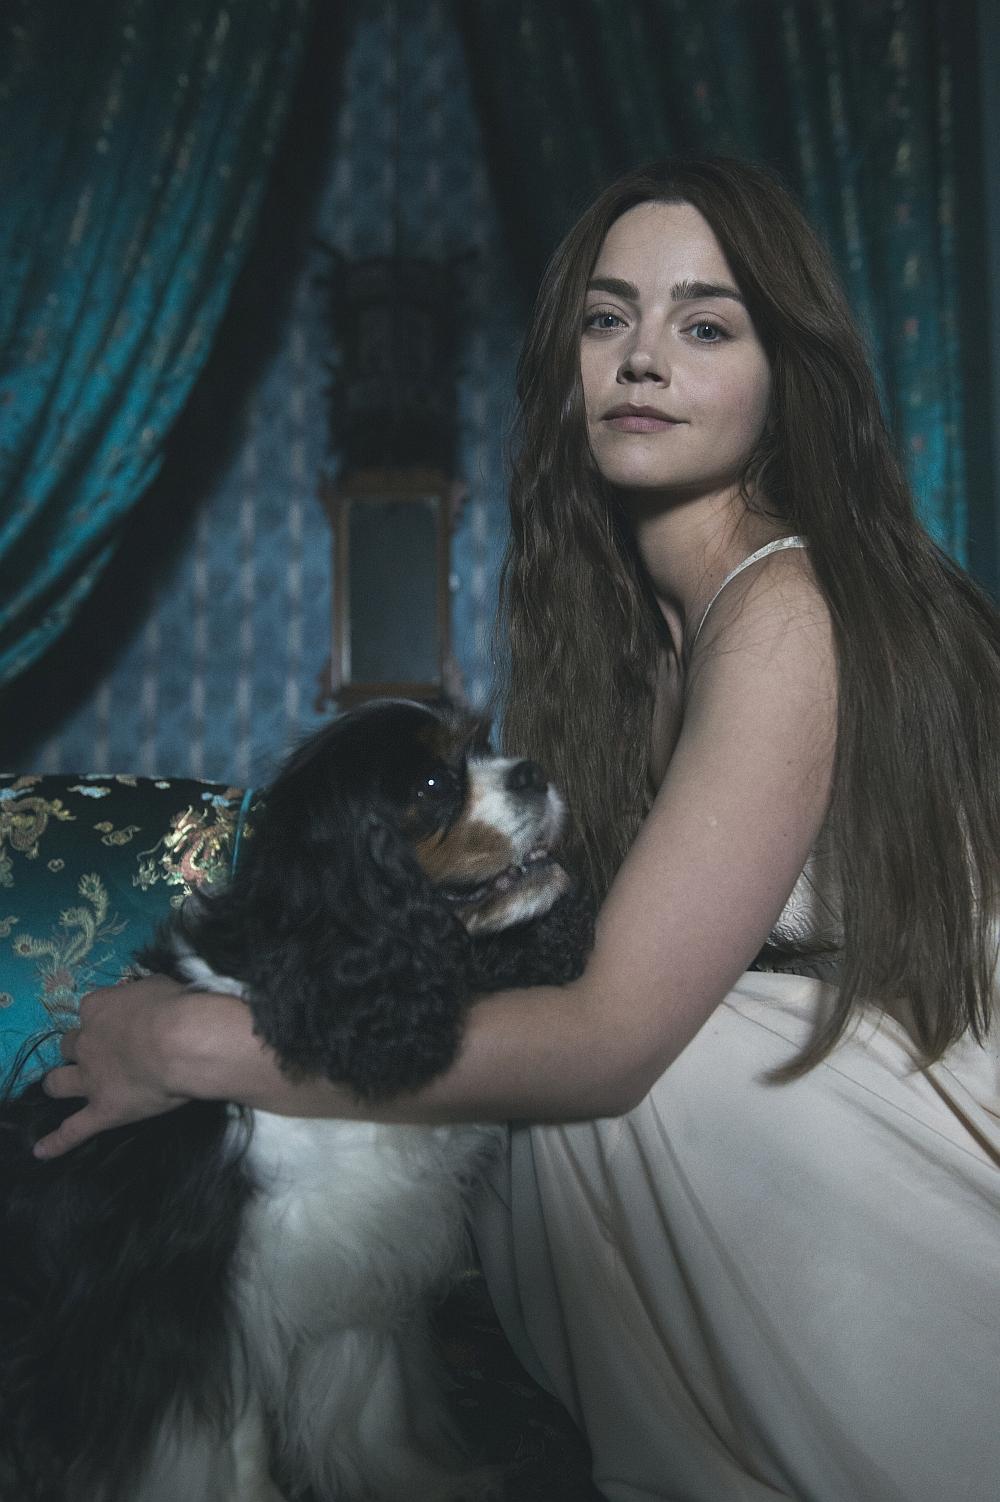 © EDEL / ITV Plc Im Bild: JENNA COLEMAN als Victoria